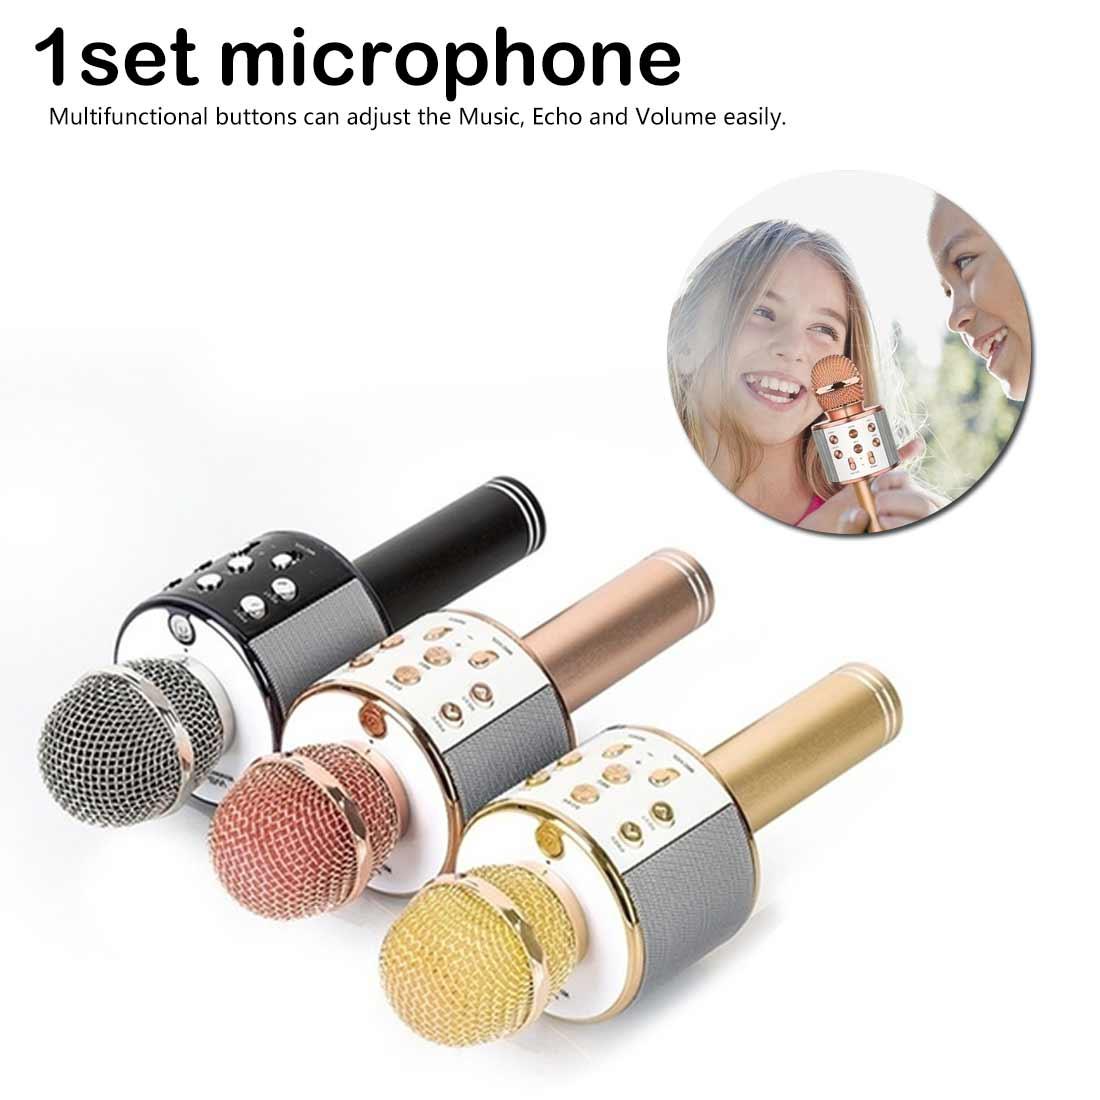 Bluetooth Wireless Microphone Speaker Handheld Microphone Karaoke Mic Music Player Singing Recorder KTV Karaoke MIC